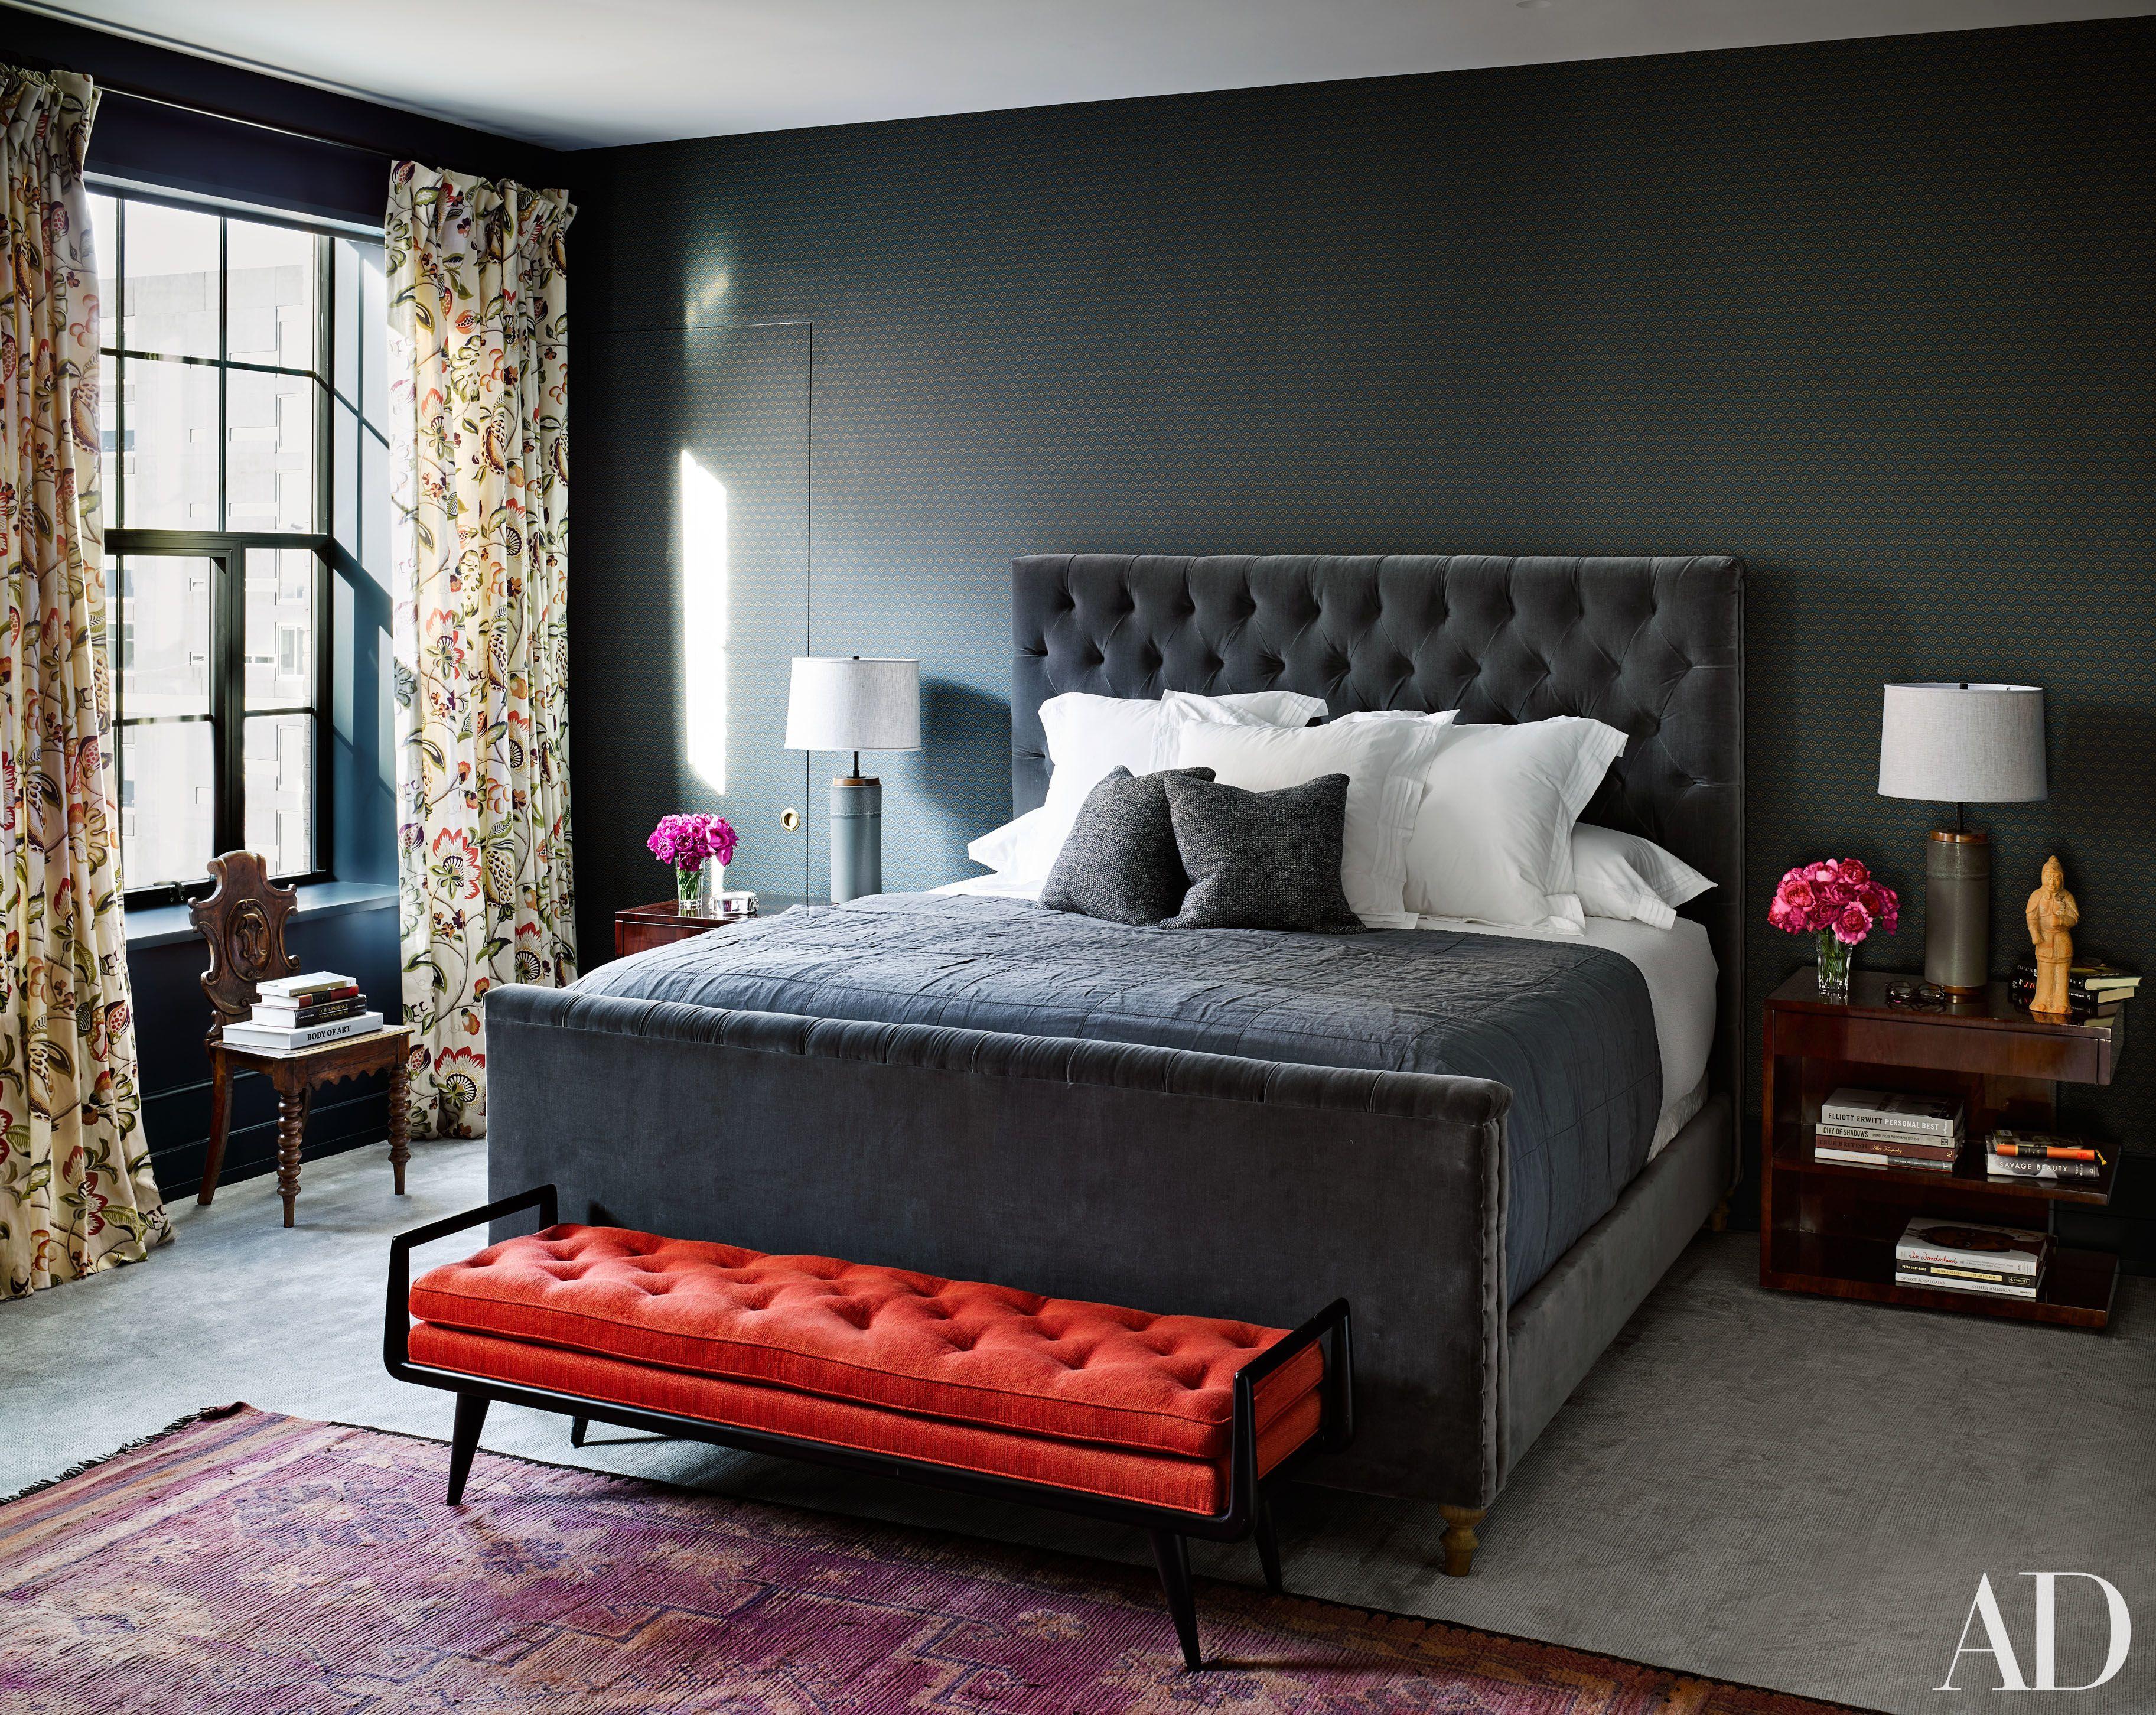 New York City Bedroom Naomi Watts And Liev Schreibers Stunning New York City Apartment